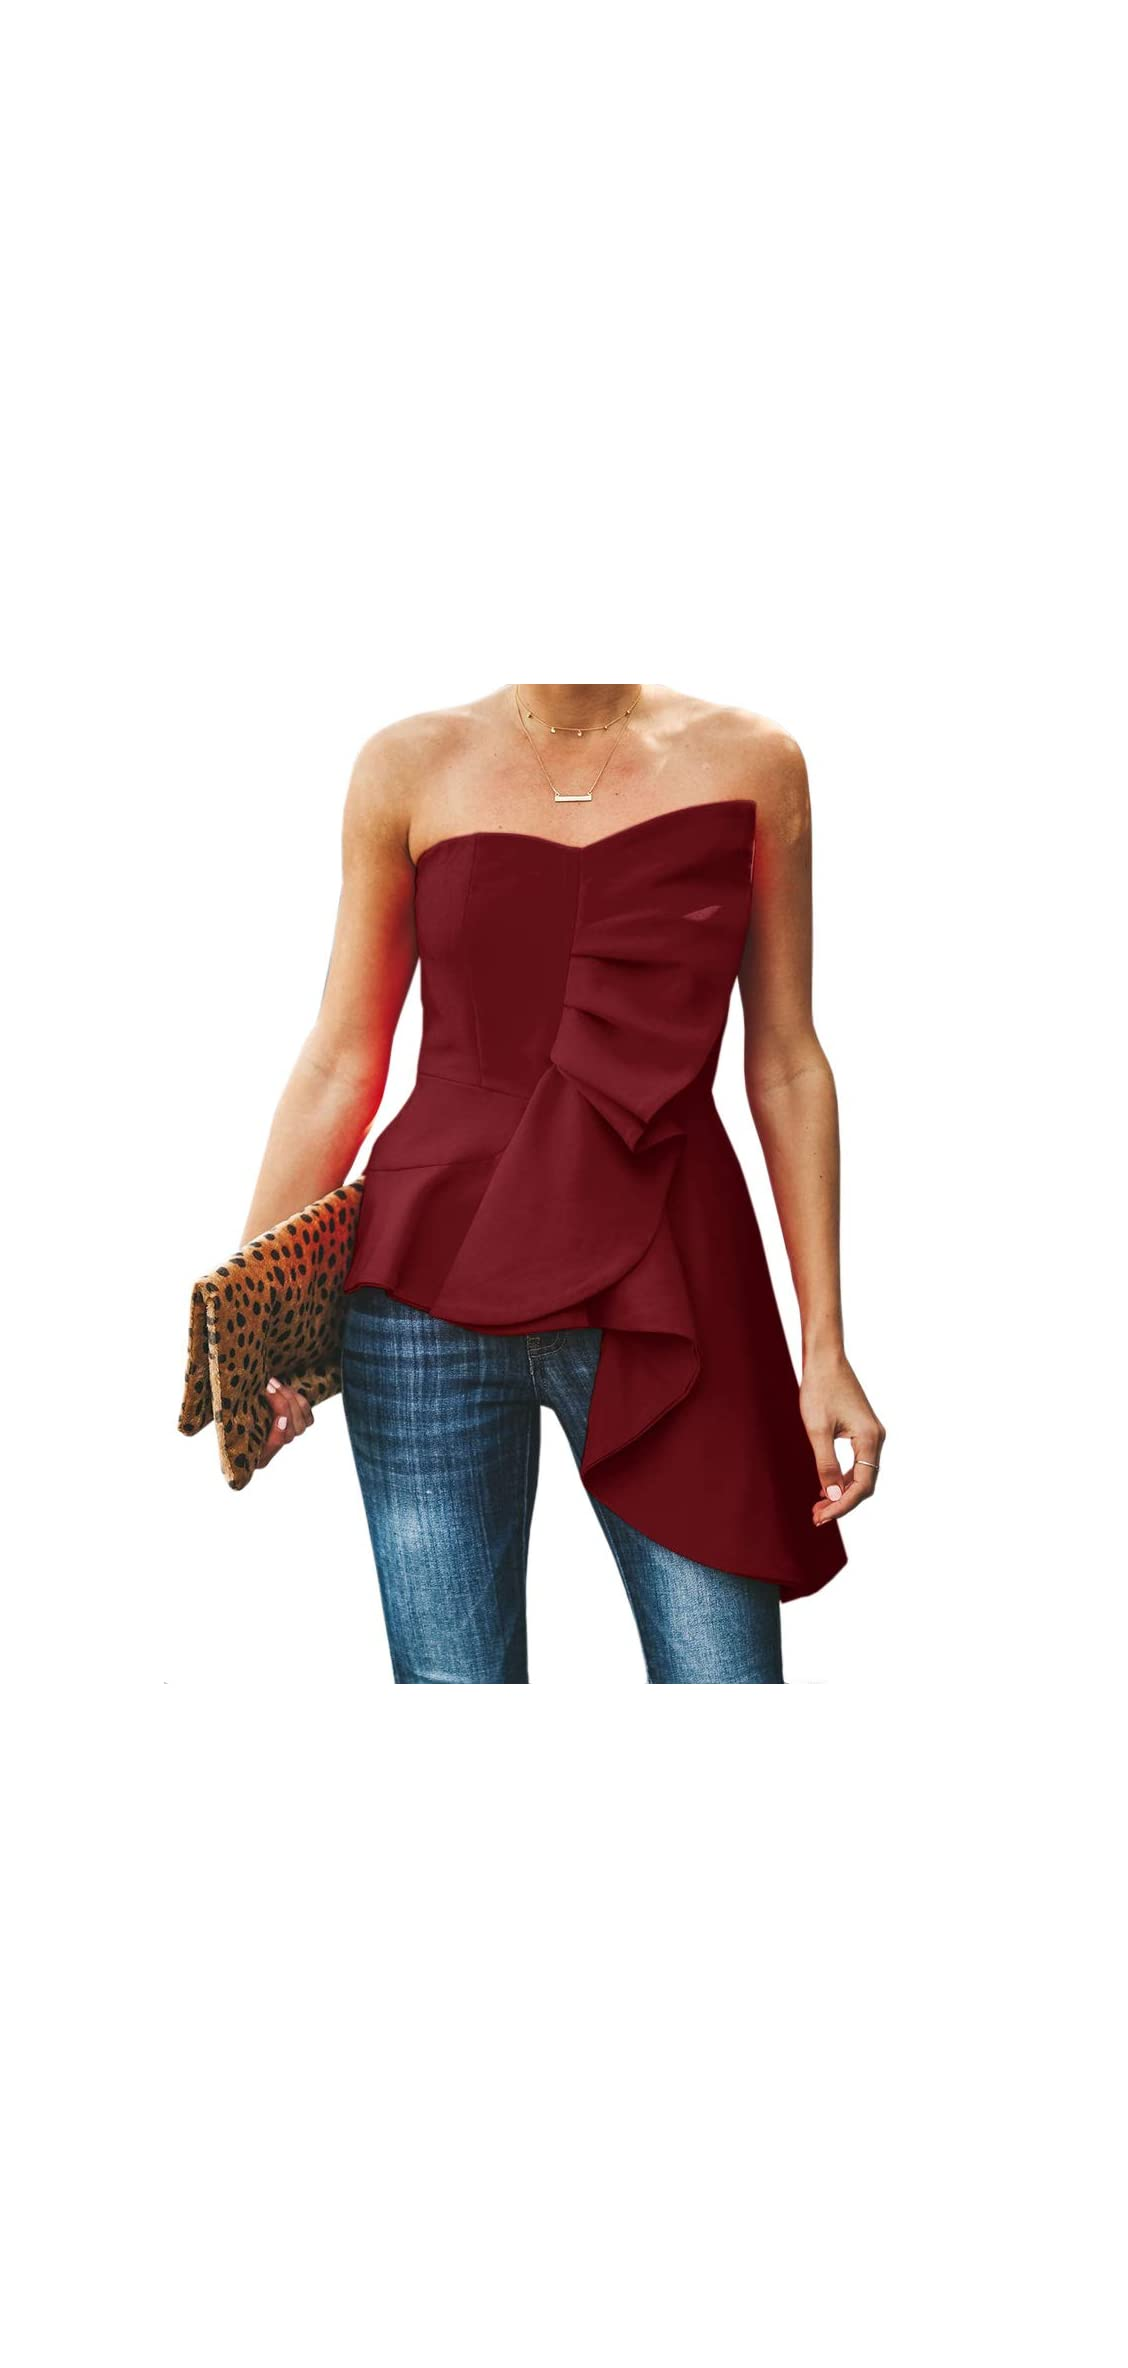 Womens Ruffle Party Blouse Strapless Asymmetrical Top